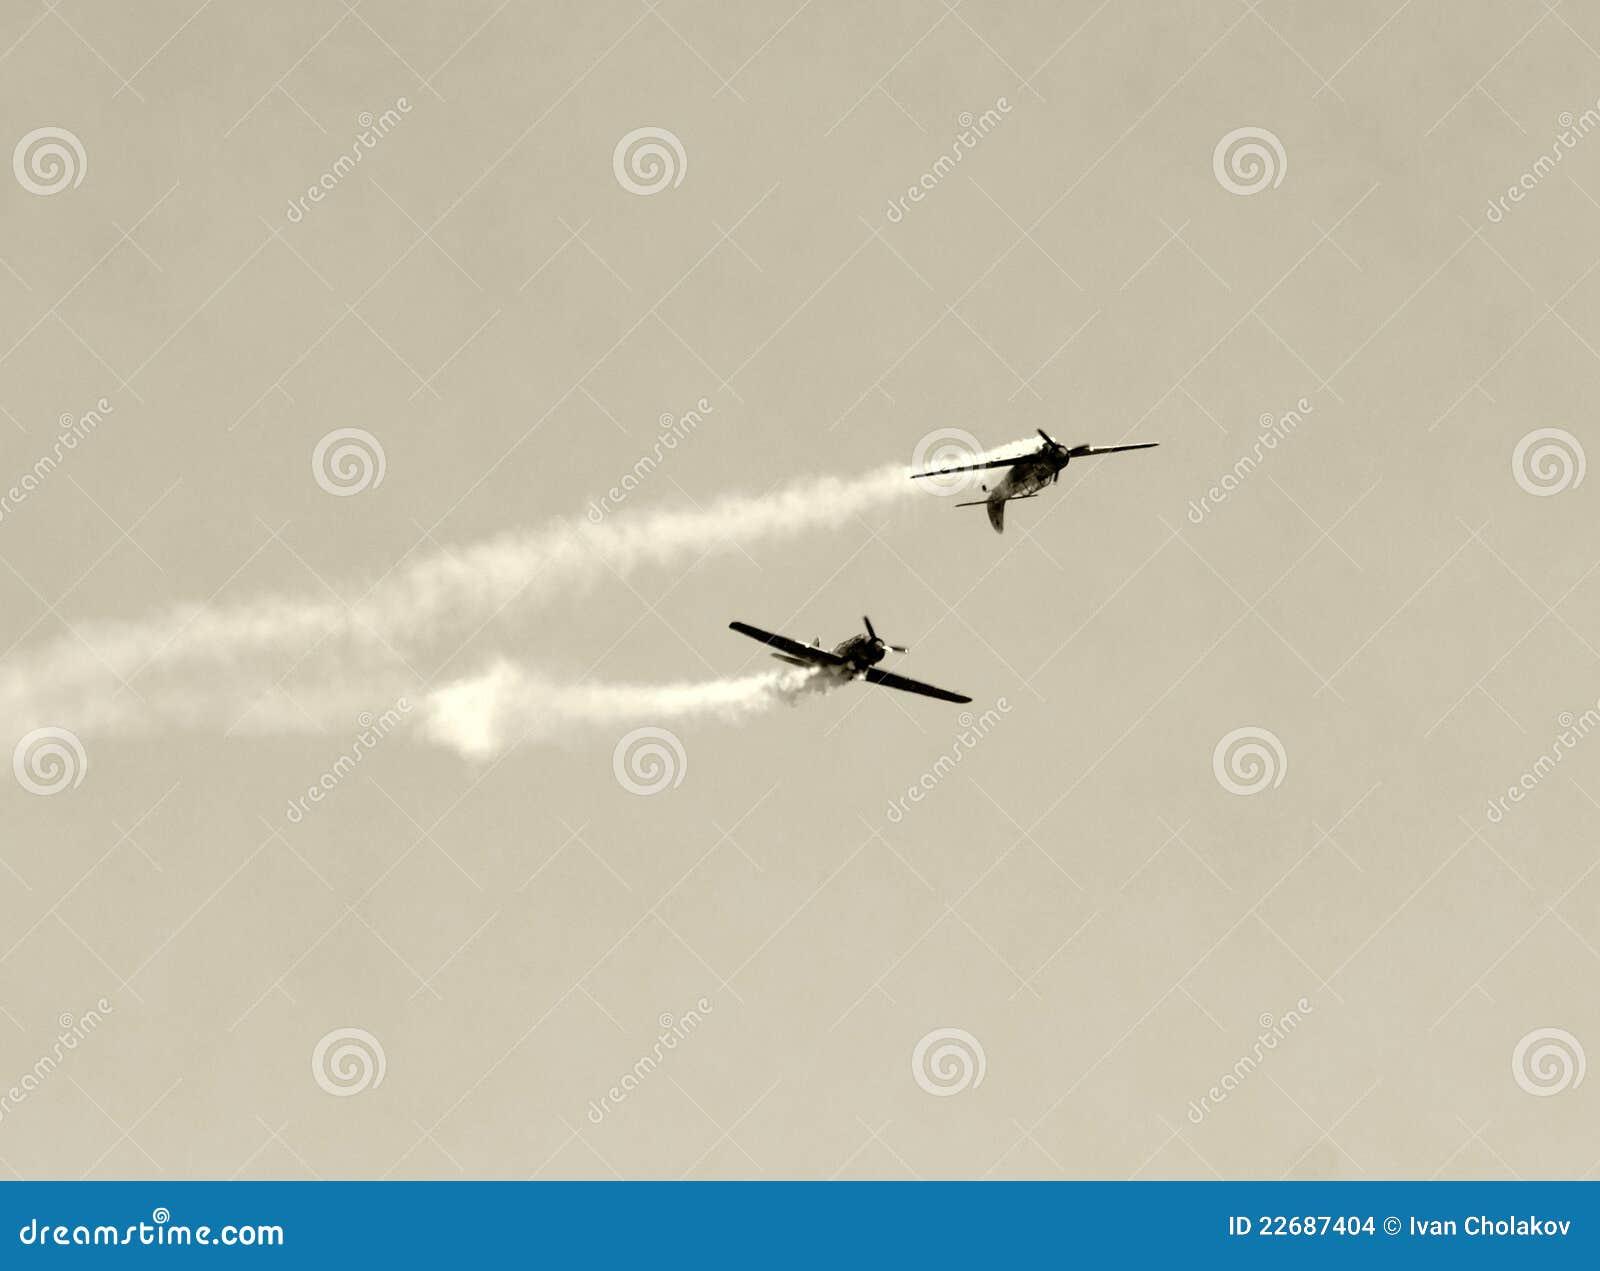 Duelo aéreo